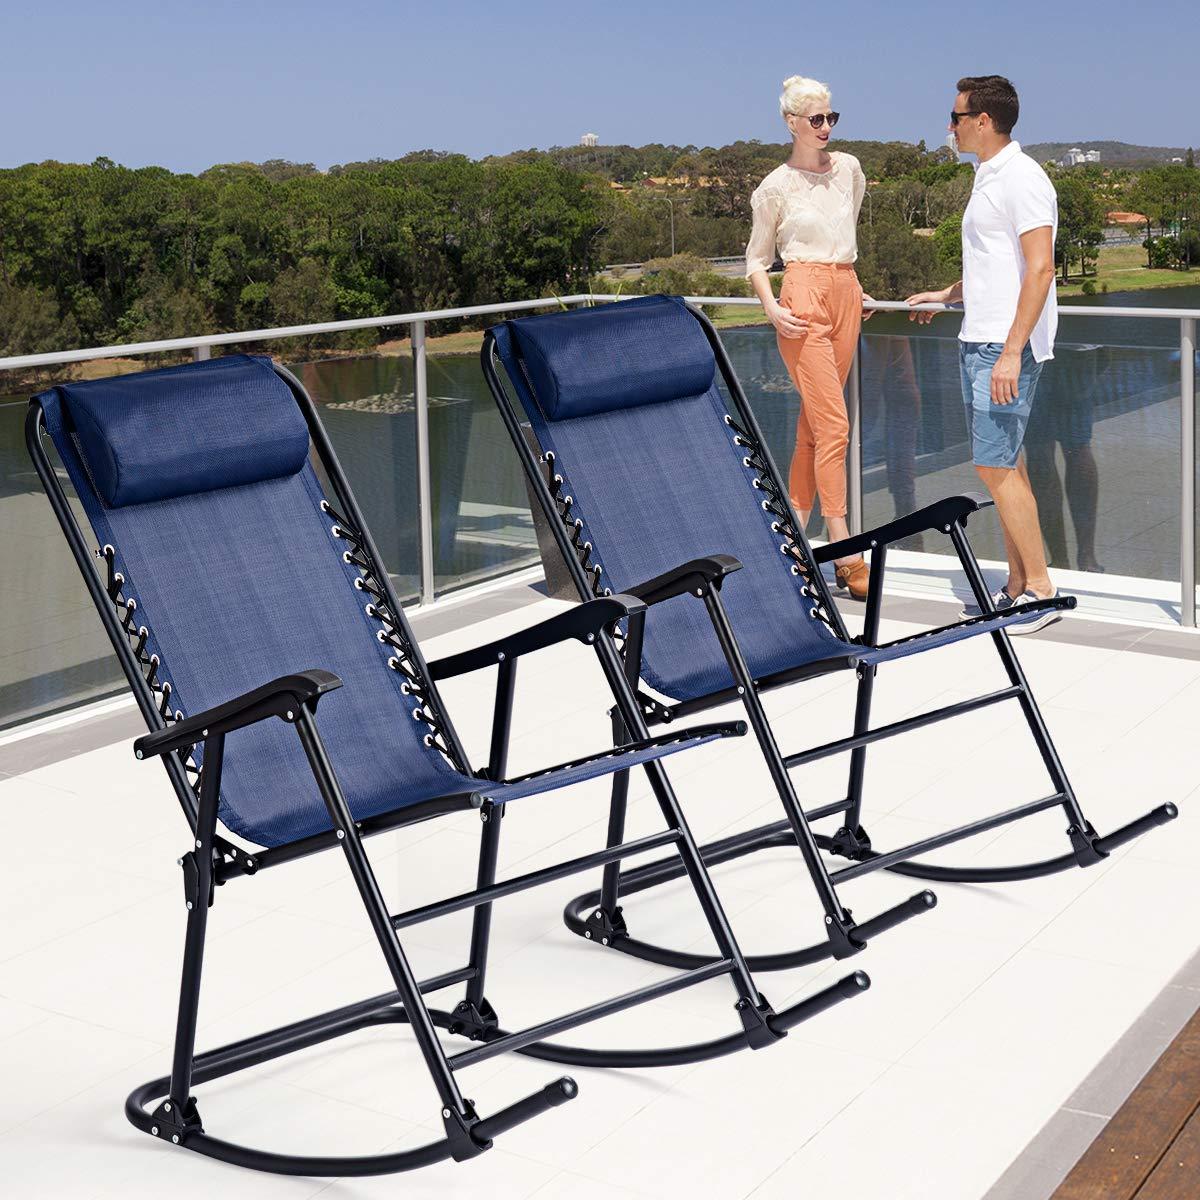 Beige Goplus Folding Rocking Chair Recliner w//Headrest Patio Pool Yard Outdoor Portable Zero Gravity Chair for Camping Fishing Beach